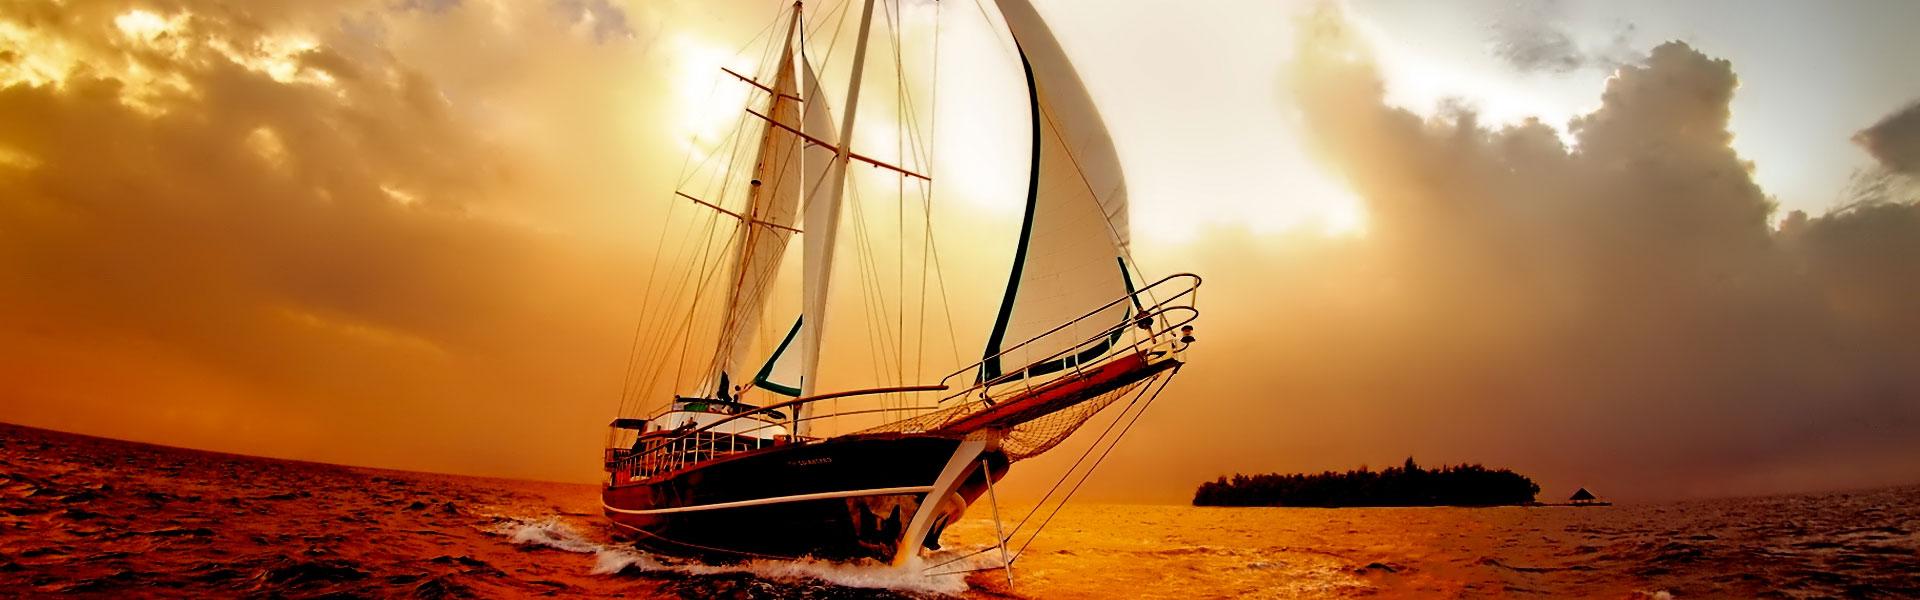 Elite-Yachting-Slide-4